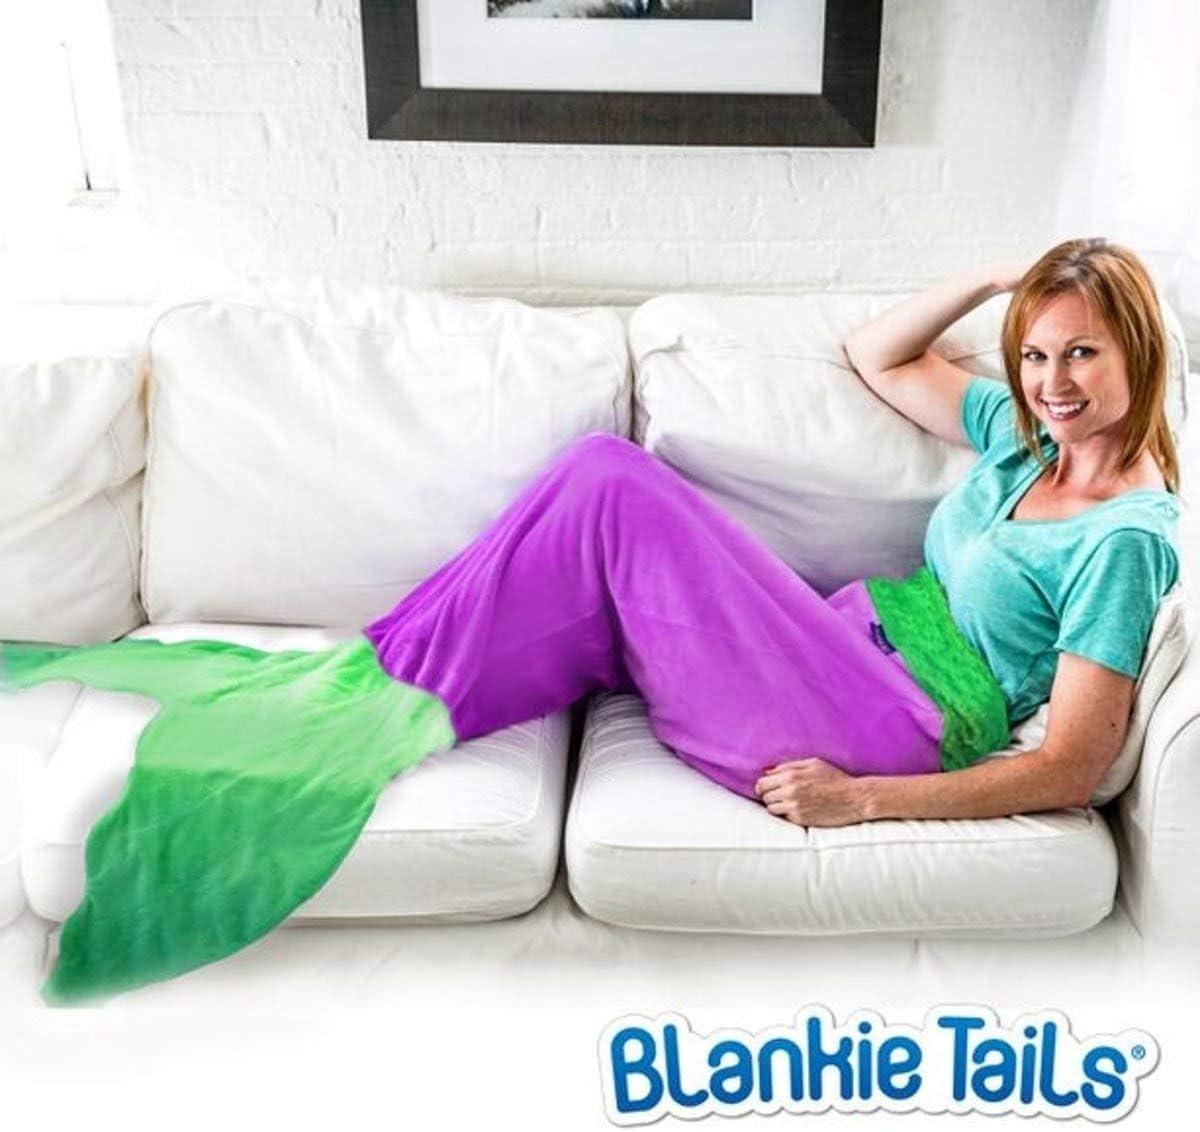 Blankie Tails The Original Mermaid Tail Blanket with Luxurious Minky Fleece Mermaid Tail for Kids Purple//Seafoam